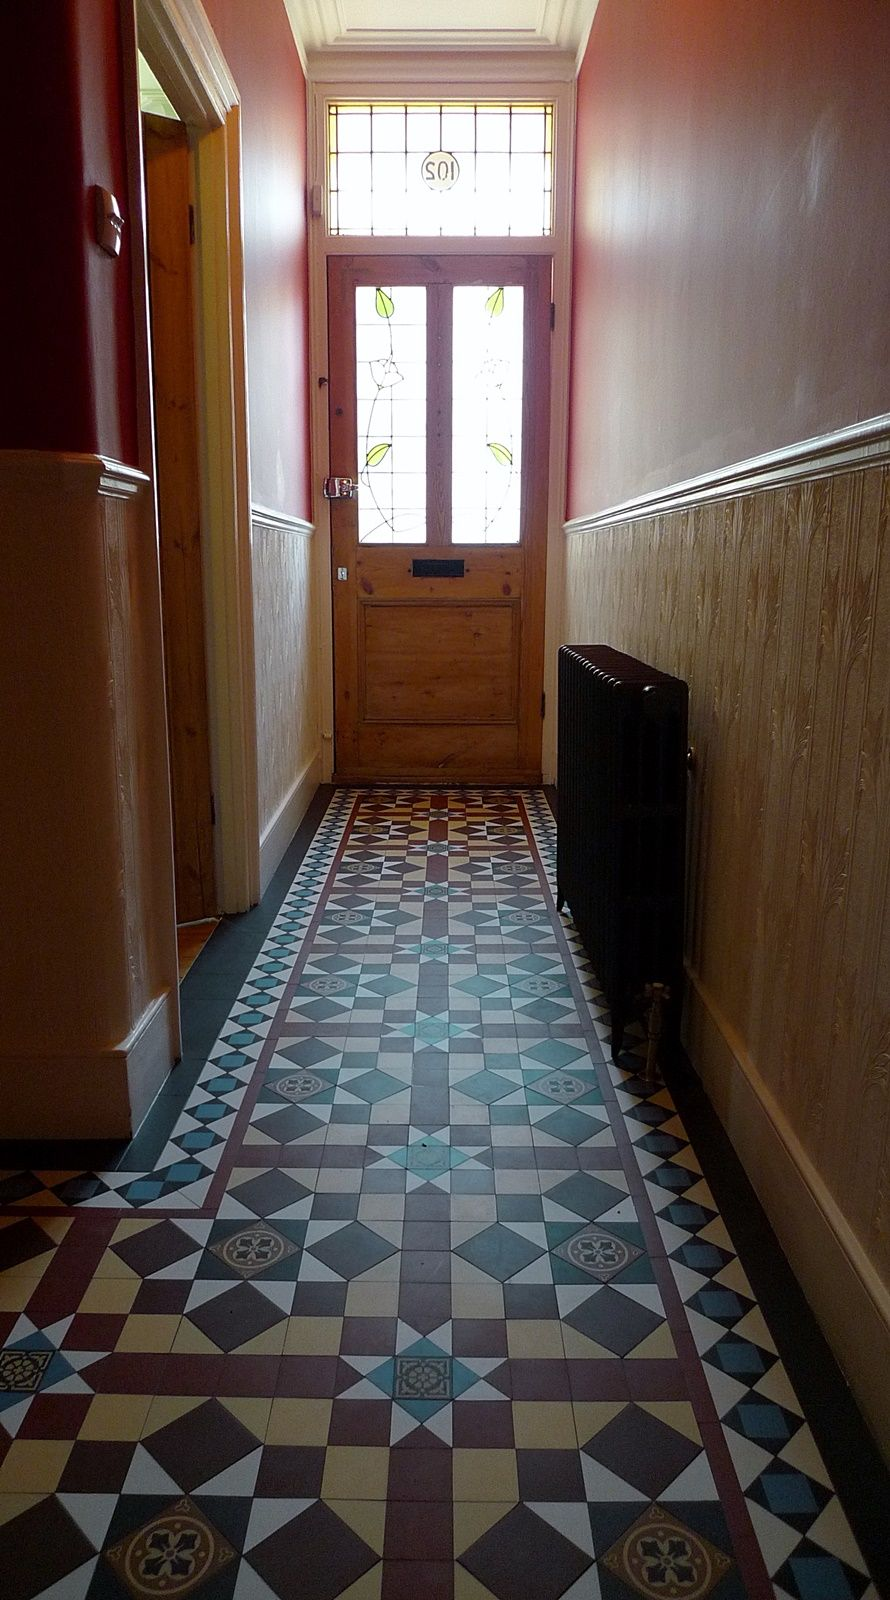 Victorian Edwardian Mosaic Tile Path Hall Way Clapham Balham Battersea Fulham Chelsea London